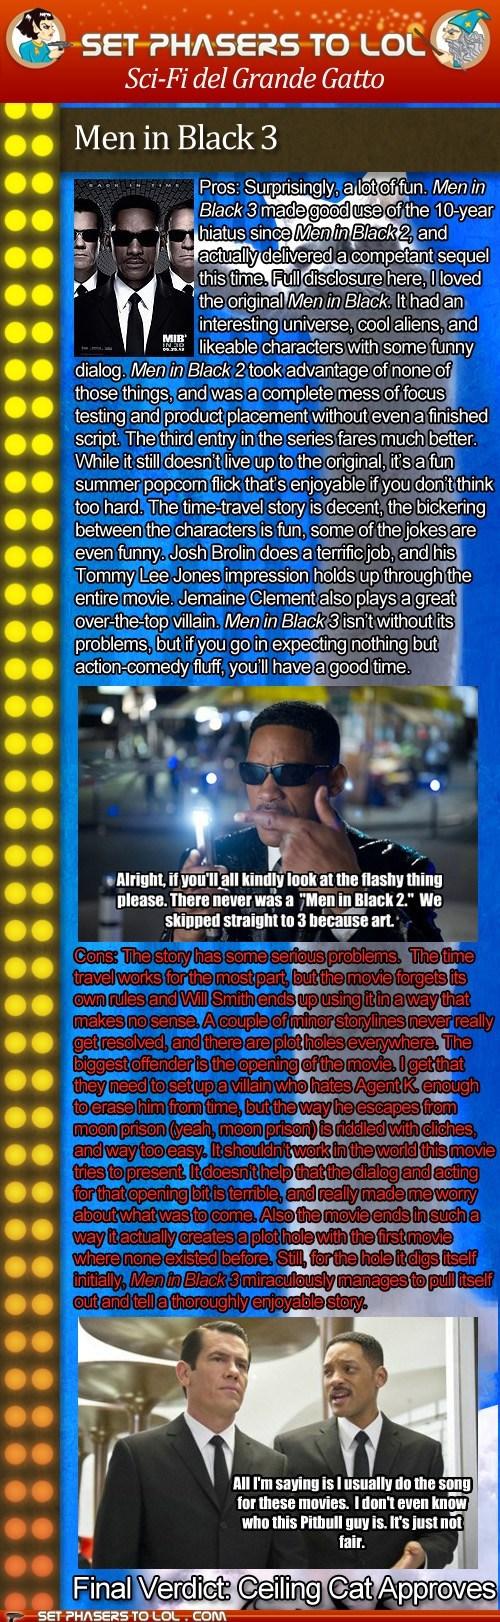 agent j agent k cinema grande gatto Josh Brolin Men In Black III movies News and Reviews tommy lee jones will smith - 6264621056